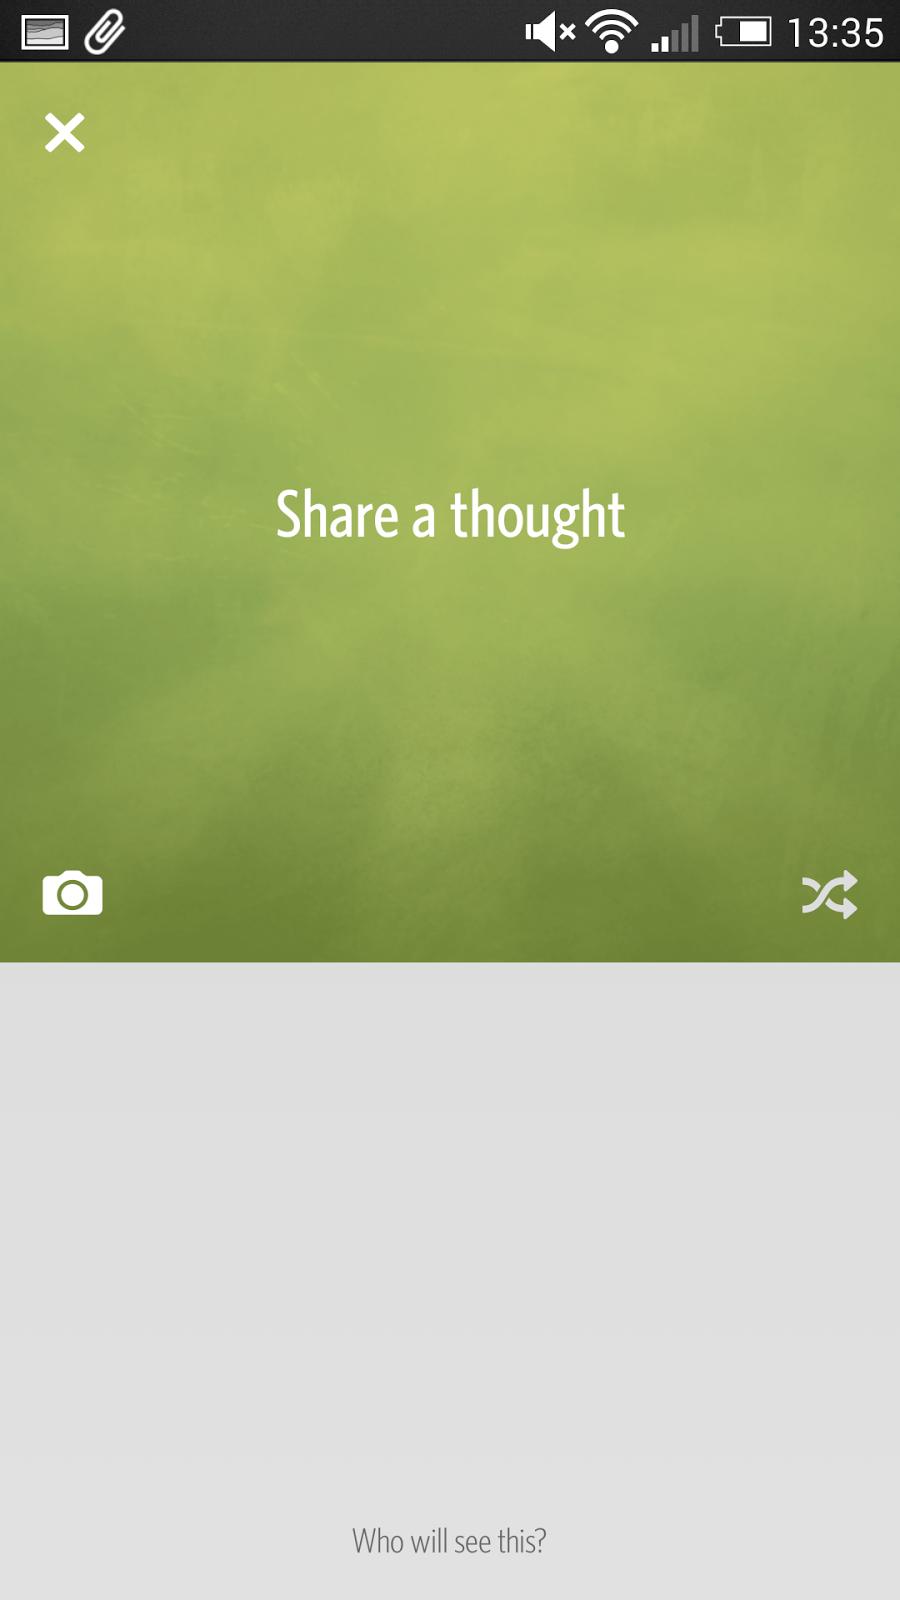 Secret 解除分享焦慮的社交 App ,對朋友匿名寫真心話 secret-10